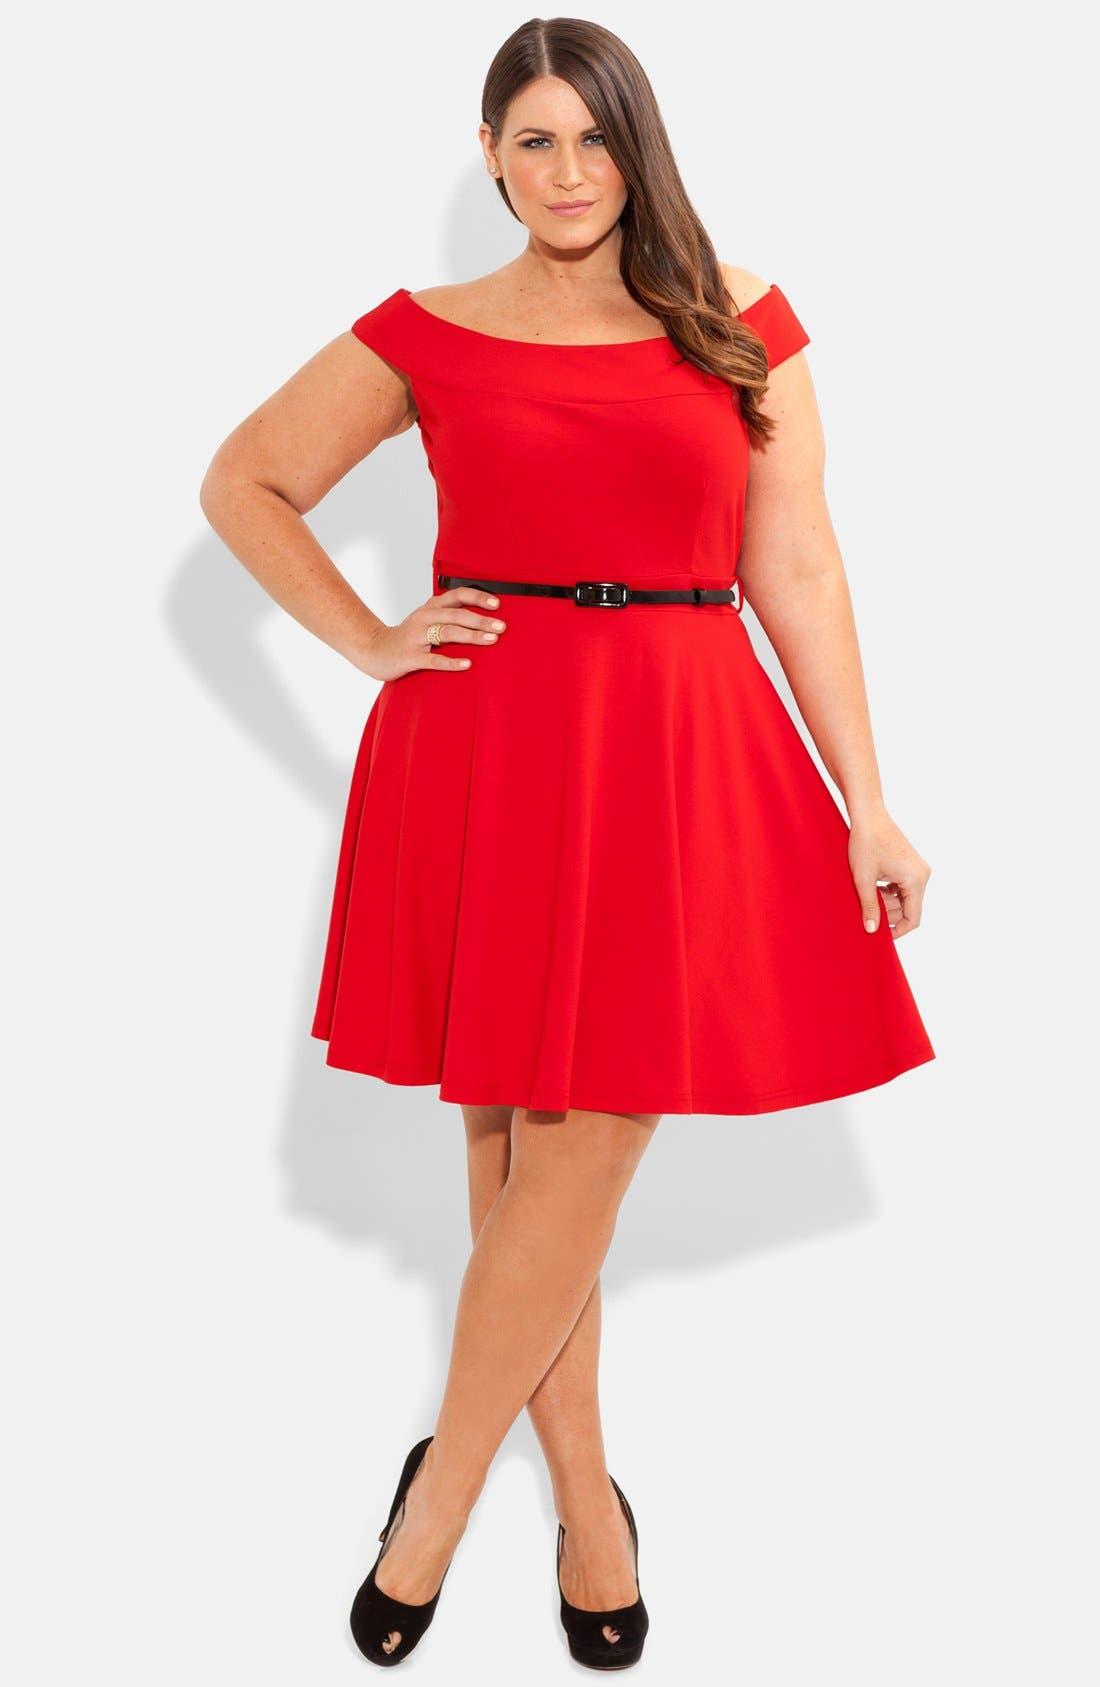 Alternate Image 1 Selected - City Chic 'Bridgette' Belted Skater Dress (Plus Size)